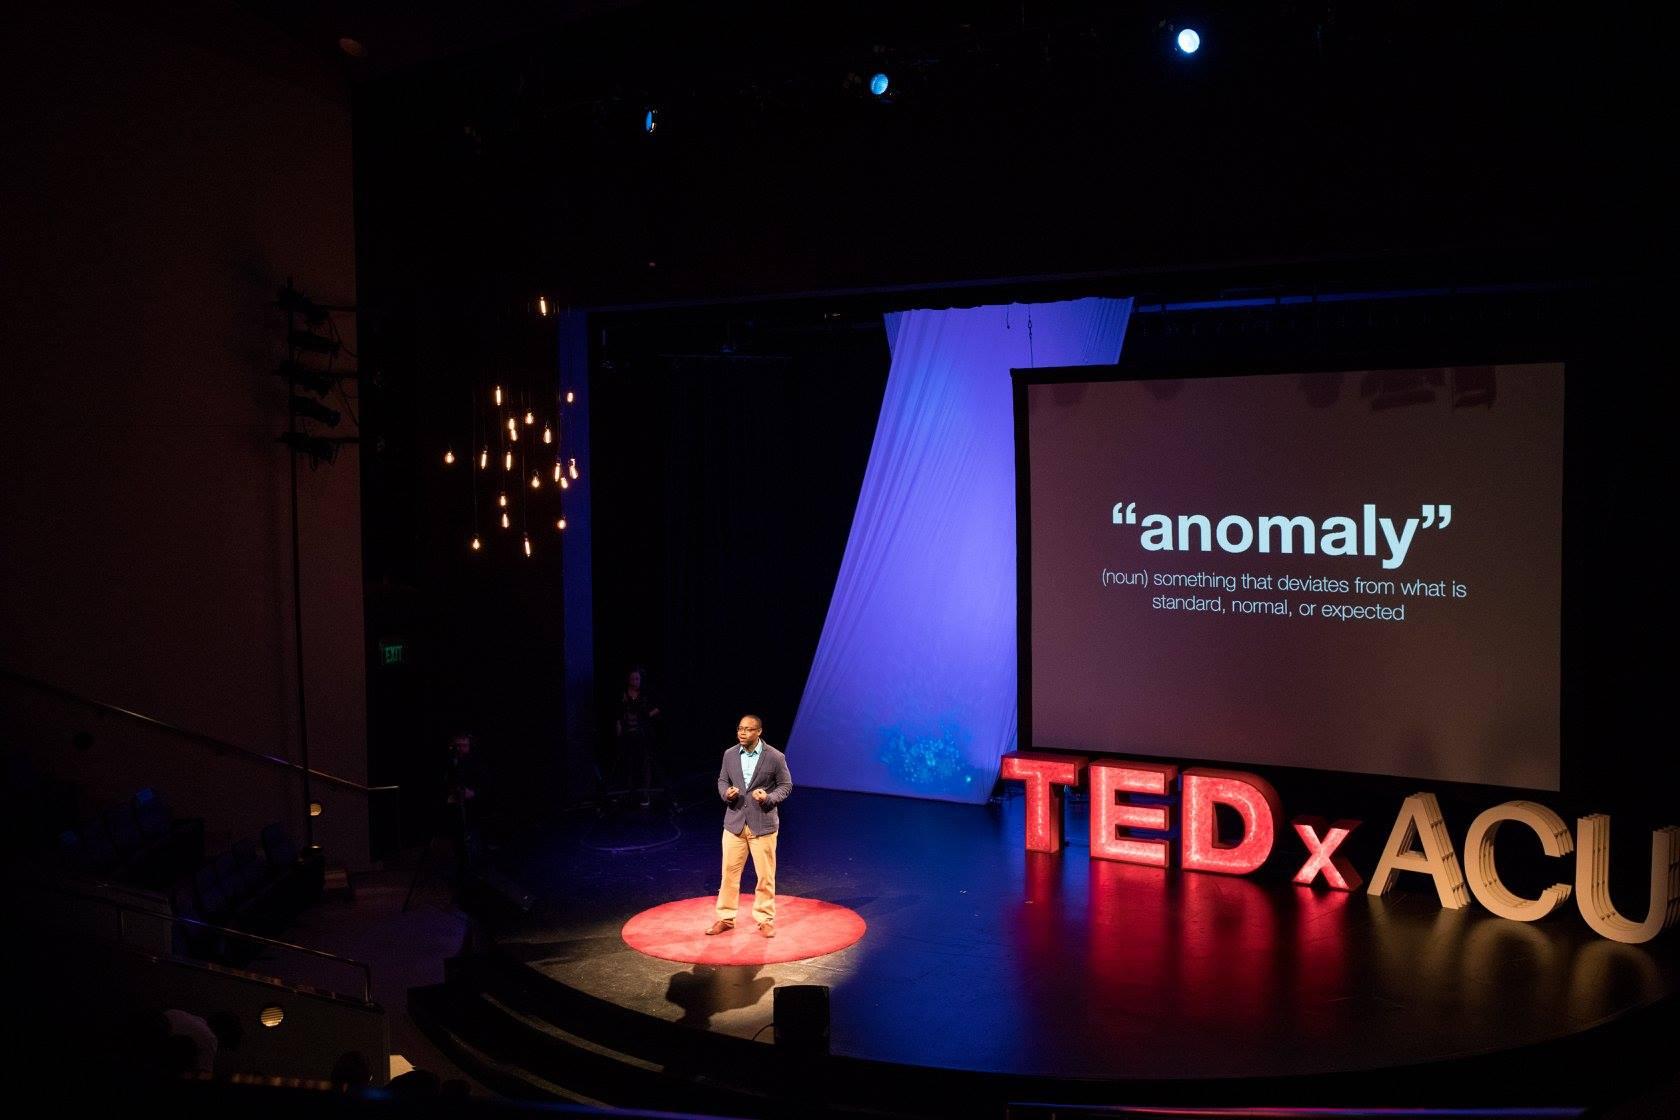 Dr. Jones presenting at TEDxACU (March 2017).